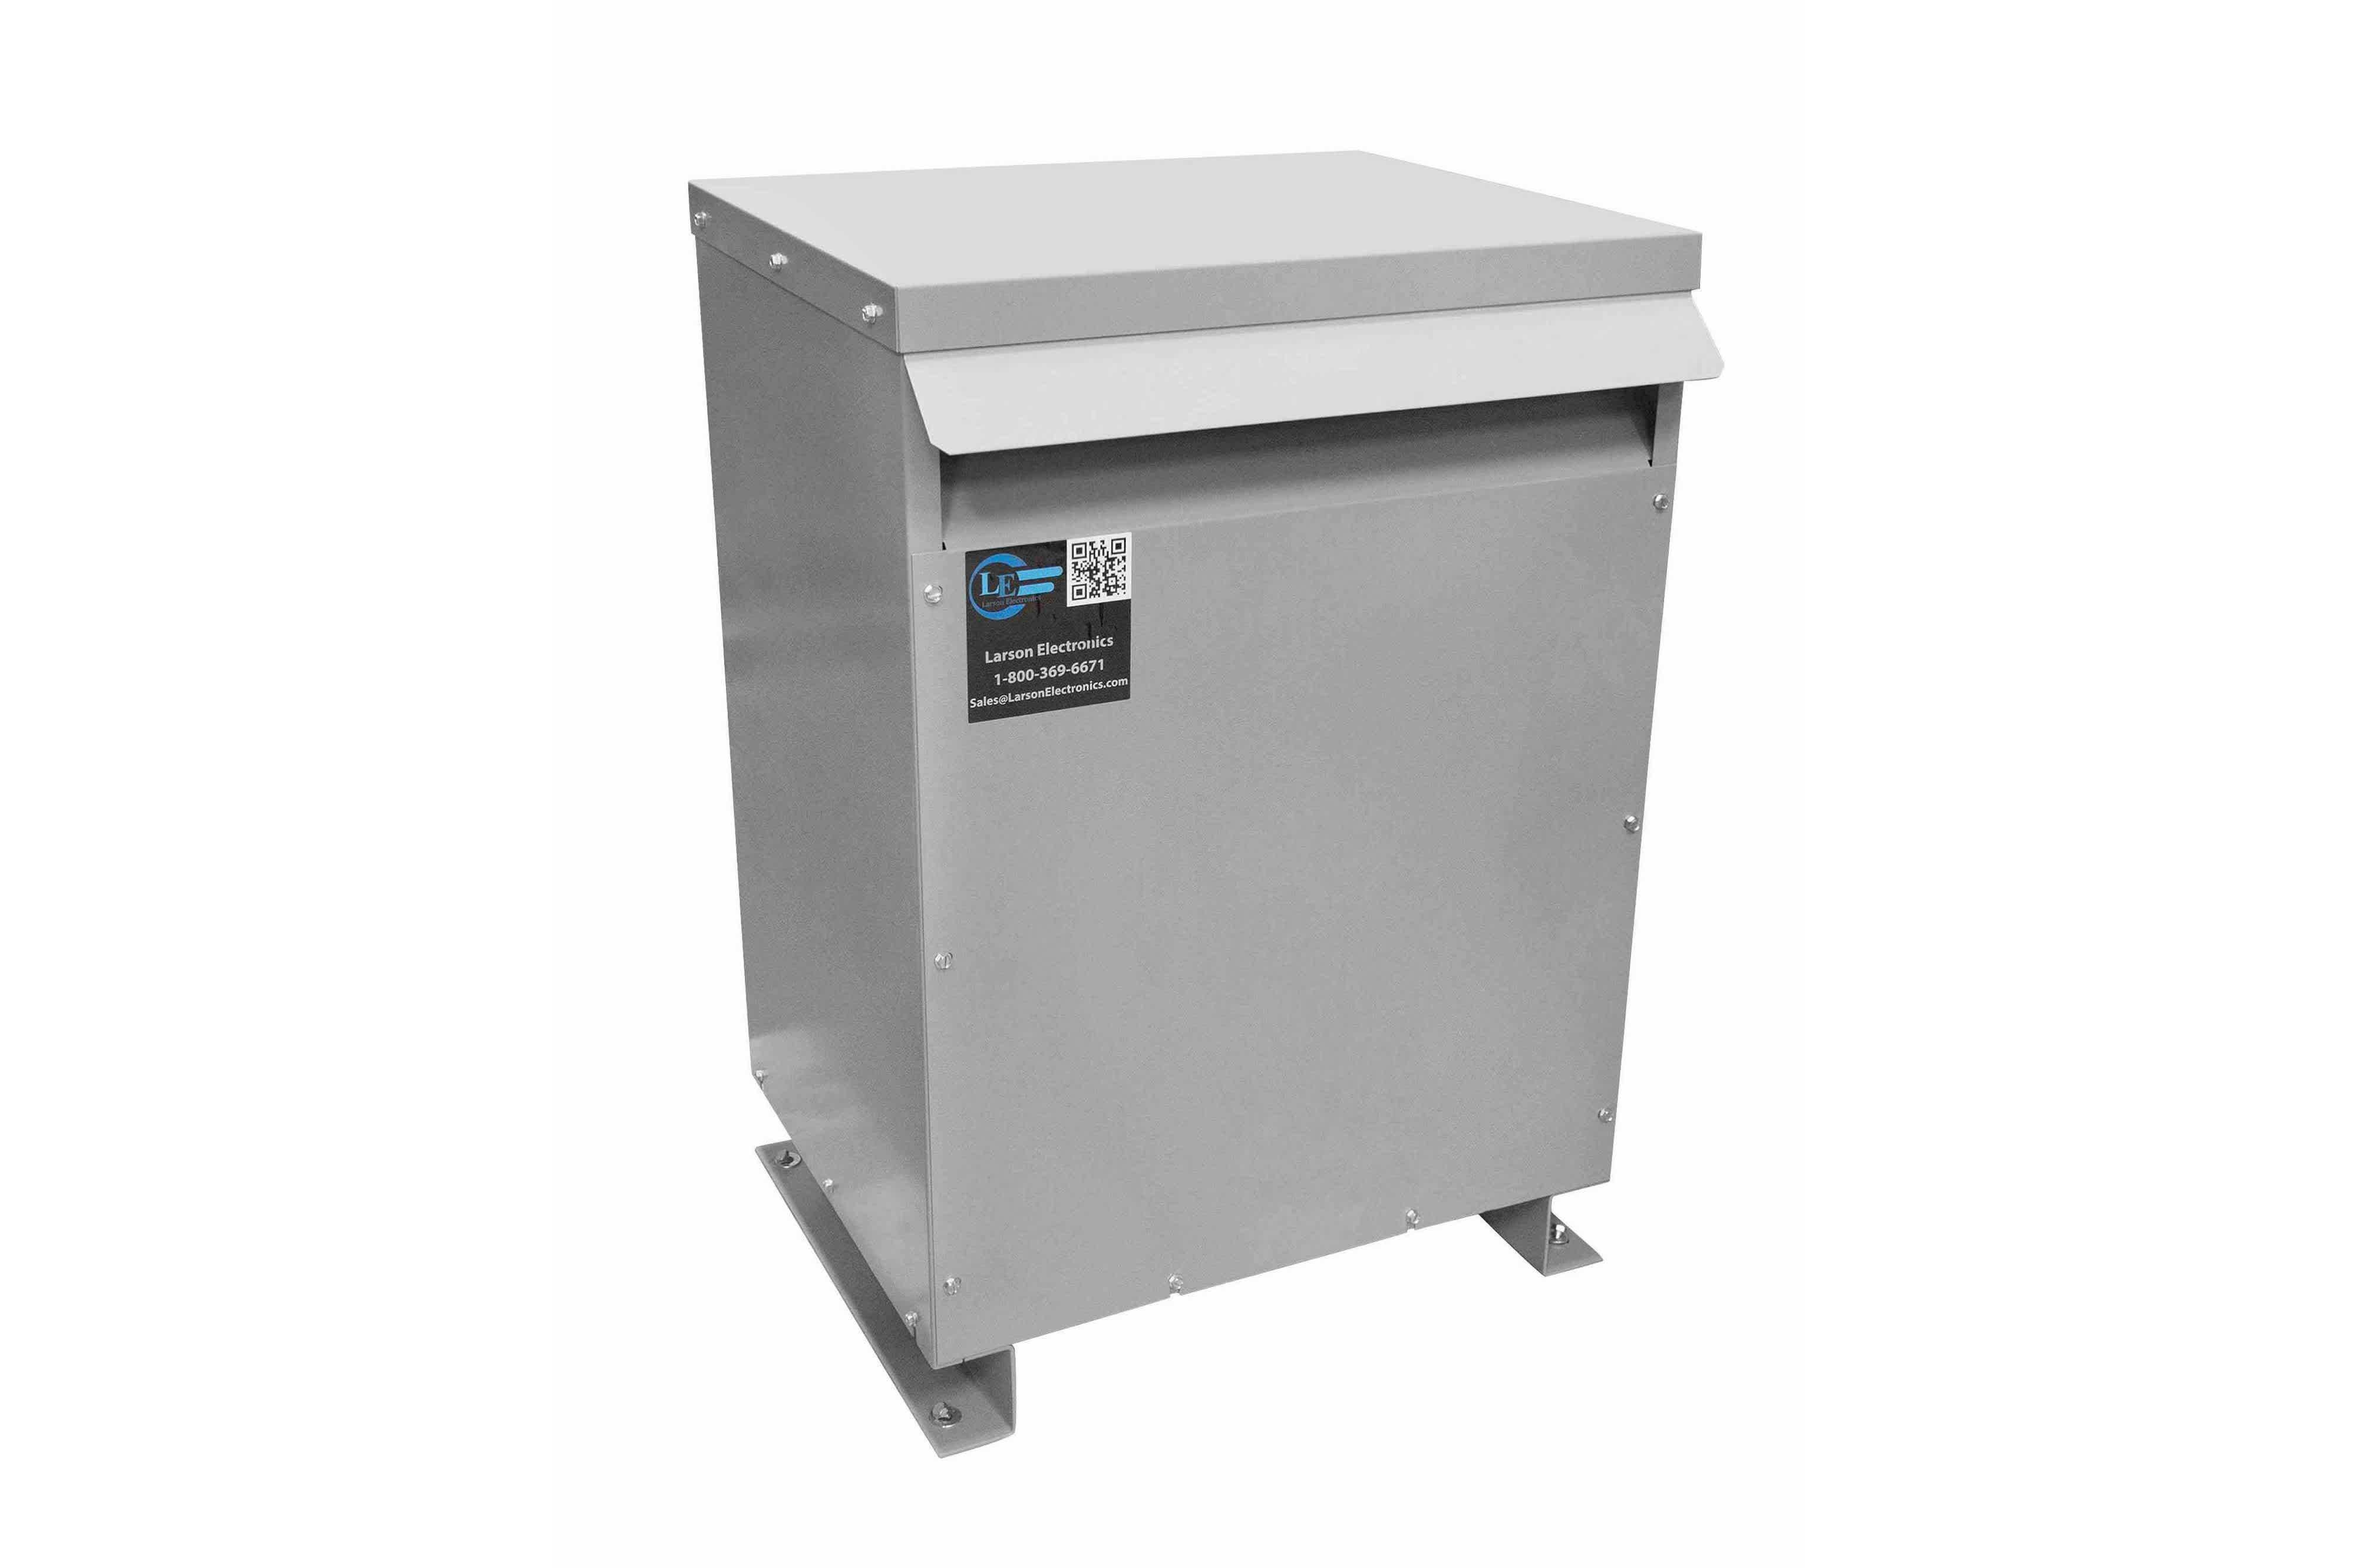 60 kVA 3PH Isolation Transformer, 575V Wye Primary, 208V Delta Secondary, N3R, Ventilated, 60 Hz